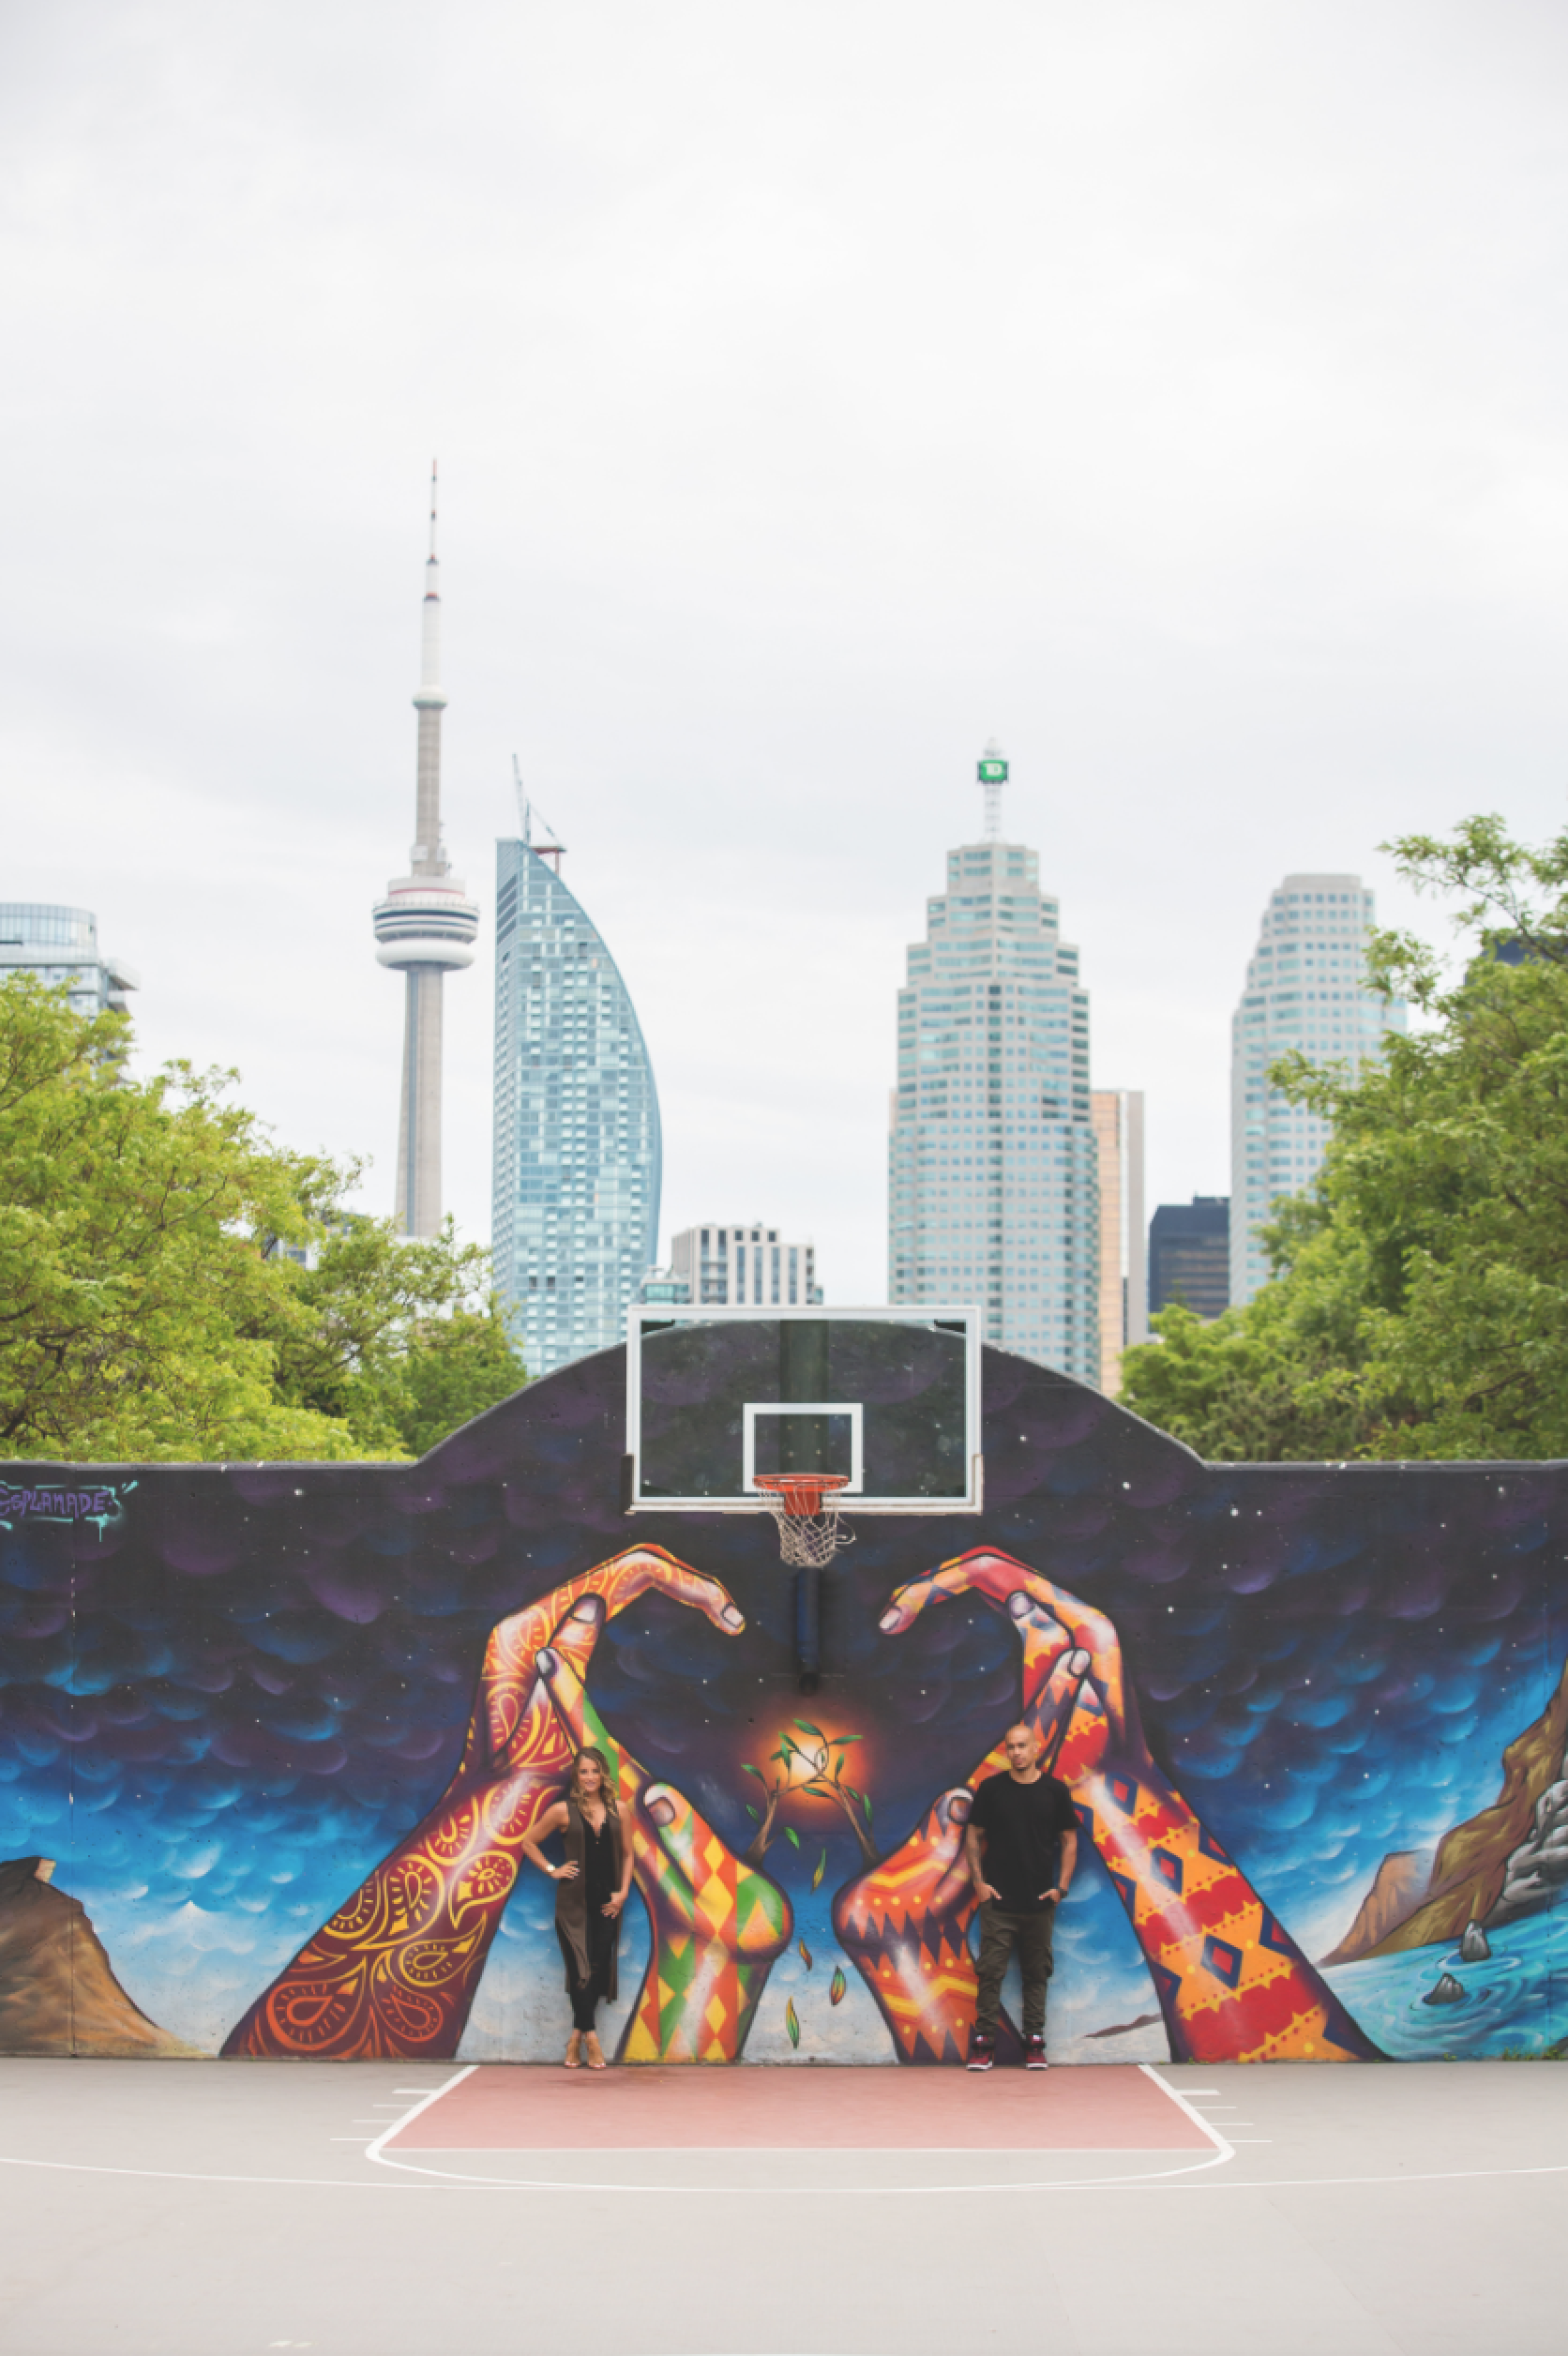 Engagement-Photos-Toronto-Downtown-Waterfront-Photographer-Wedding-Hamilton-GTA-Niagara-Oakville-Modern-Moments-by-Lauren-Engaged-Photography-Photo-Image-1.png